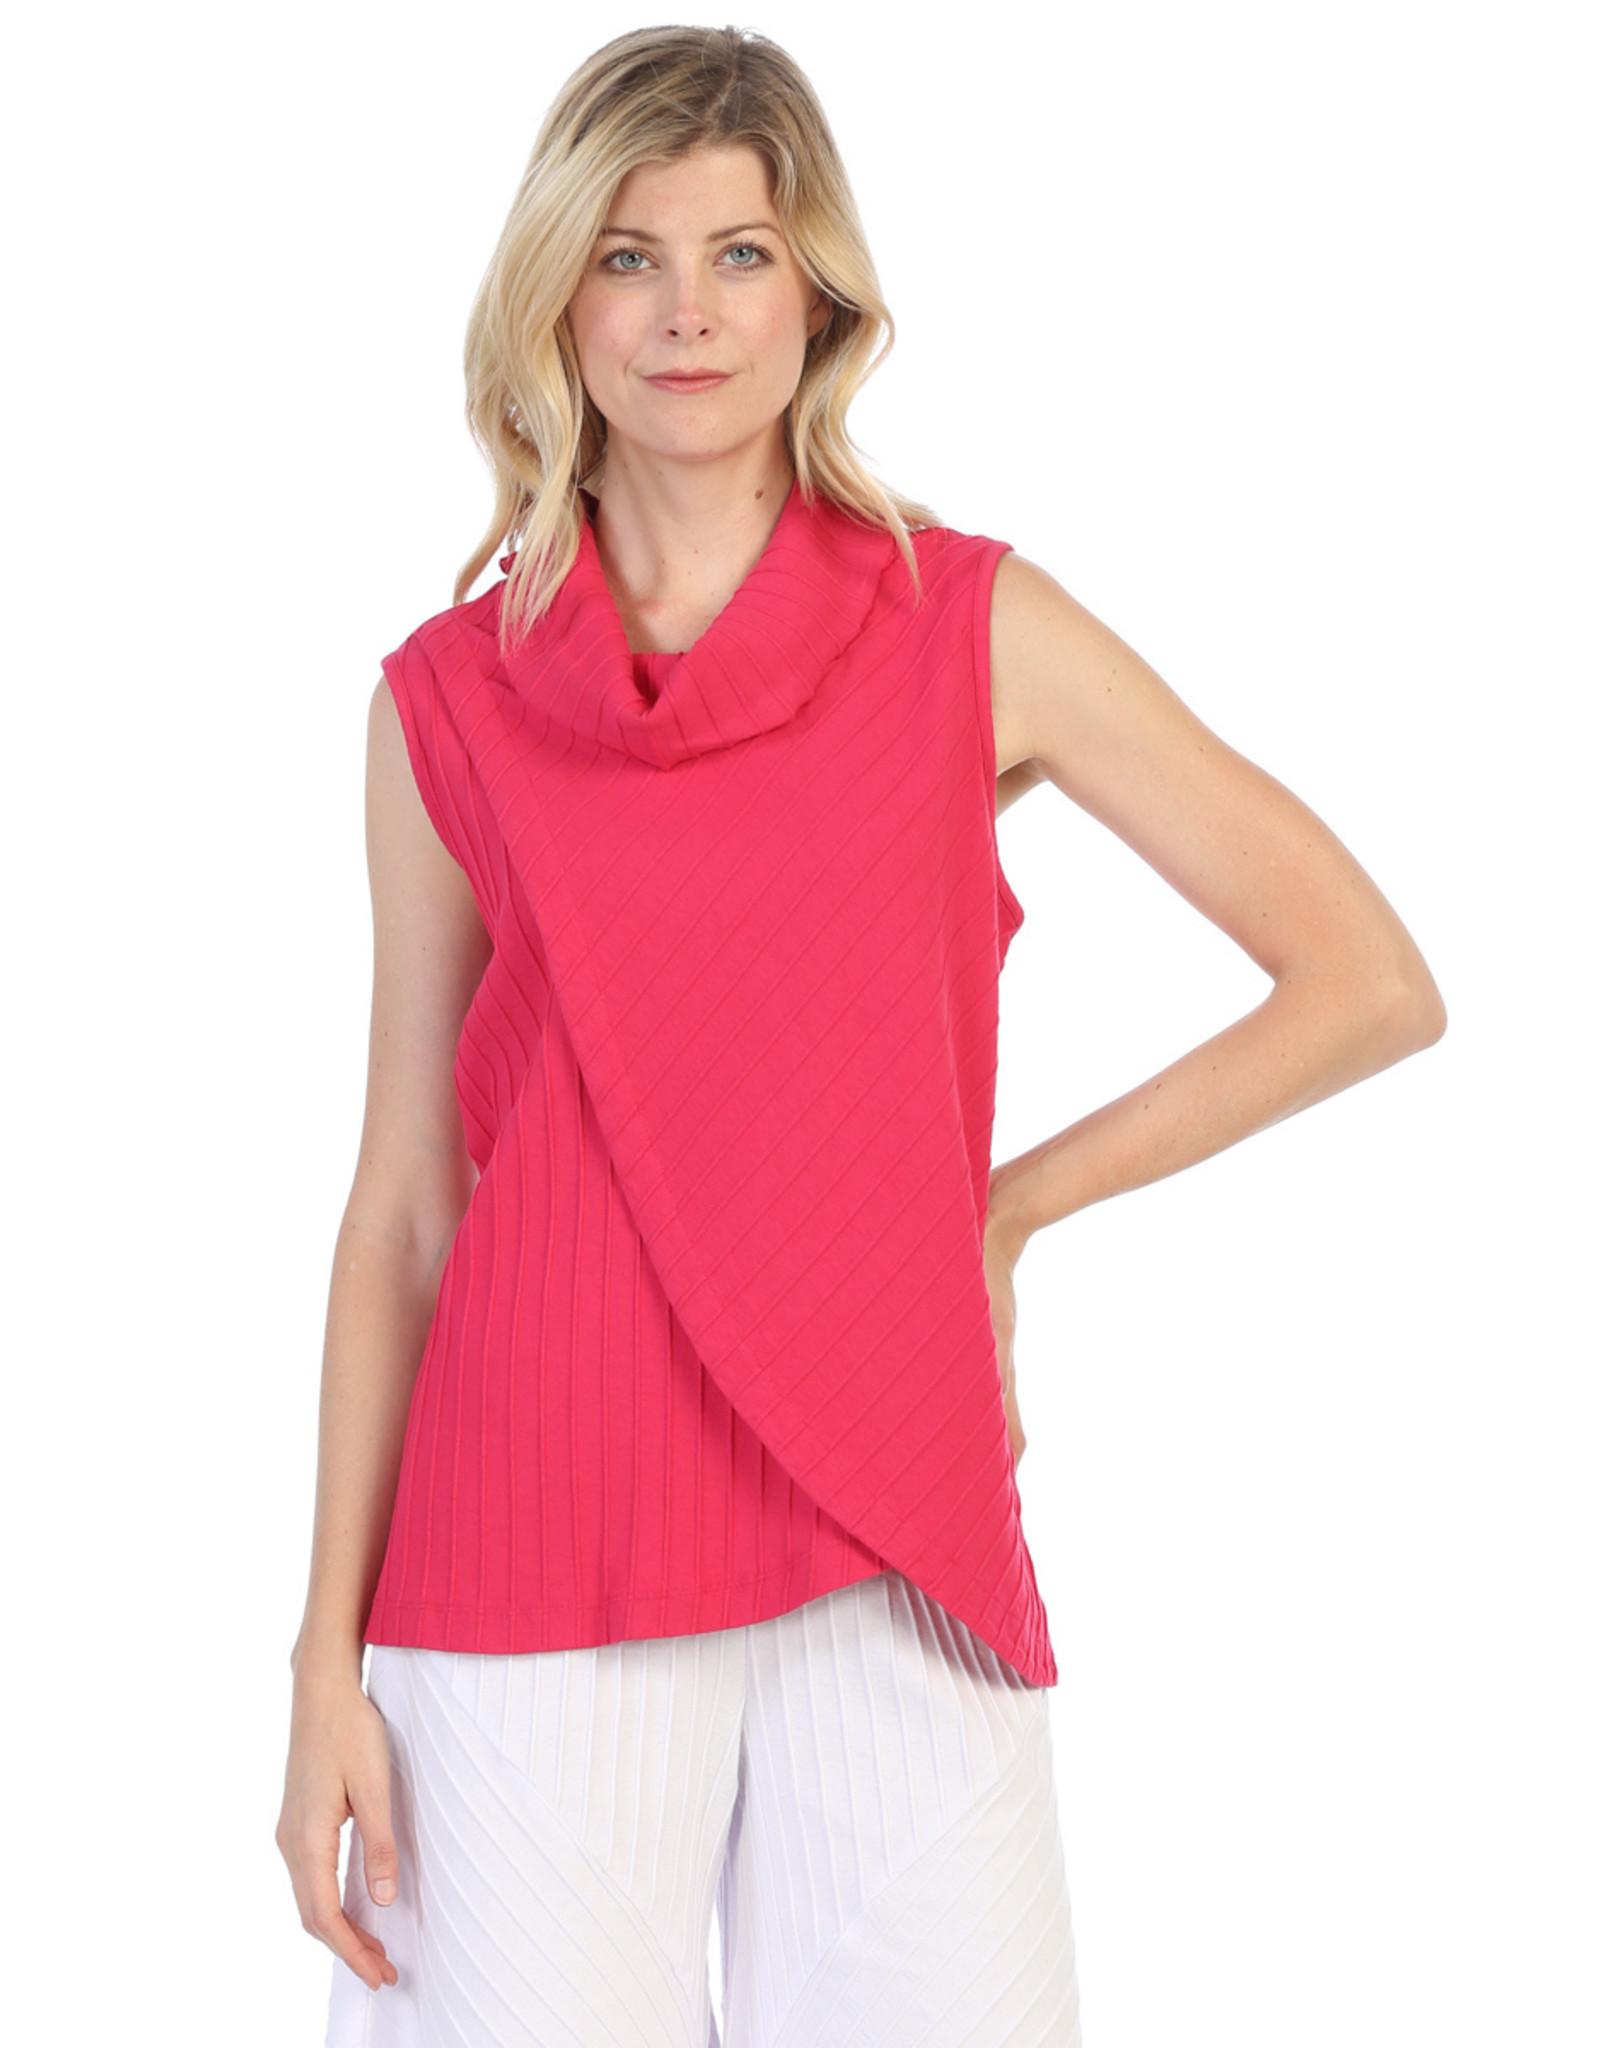 Focus Fashion Cowl Neck Wrapped Top CS364 (S1)